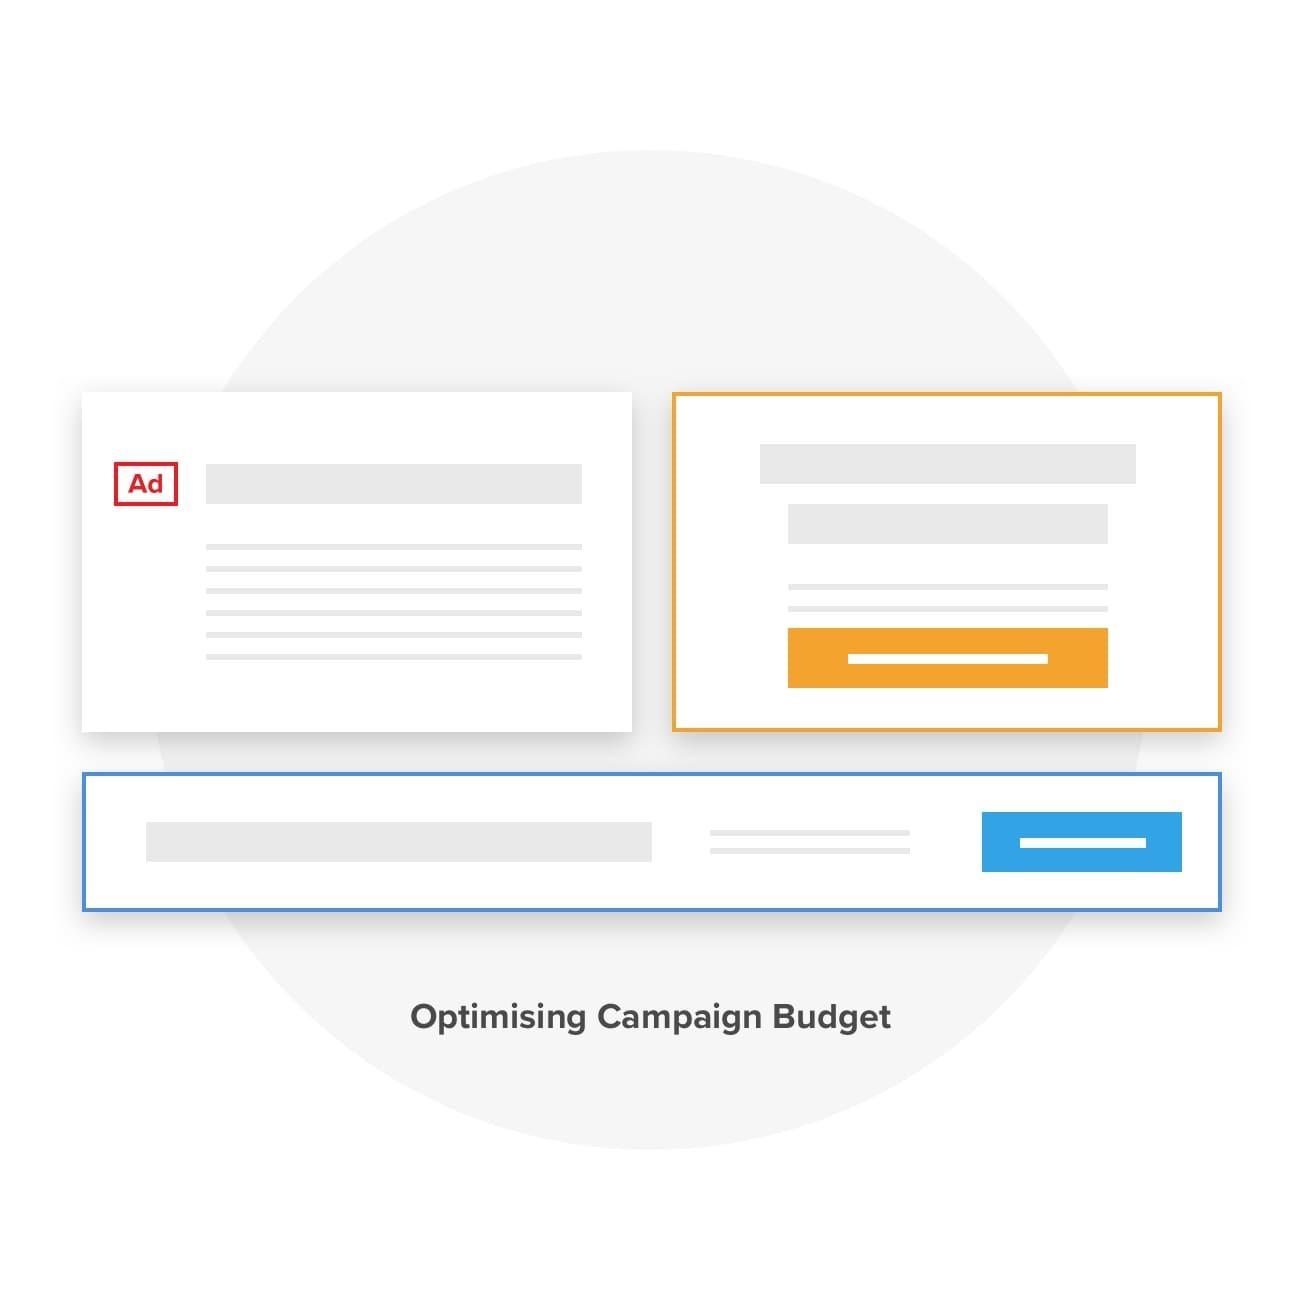 Budget Optimisation